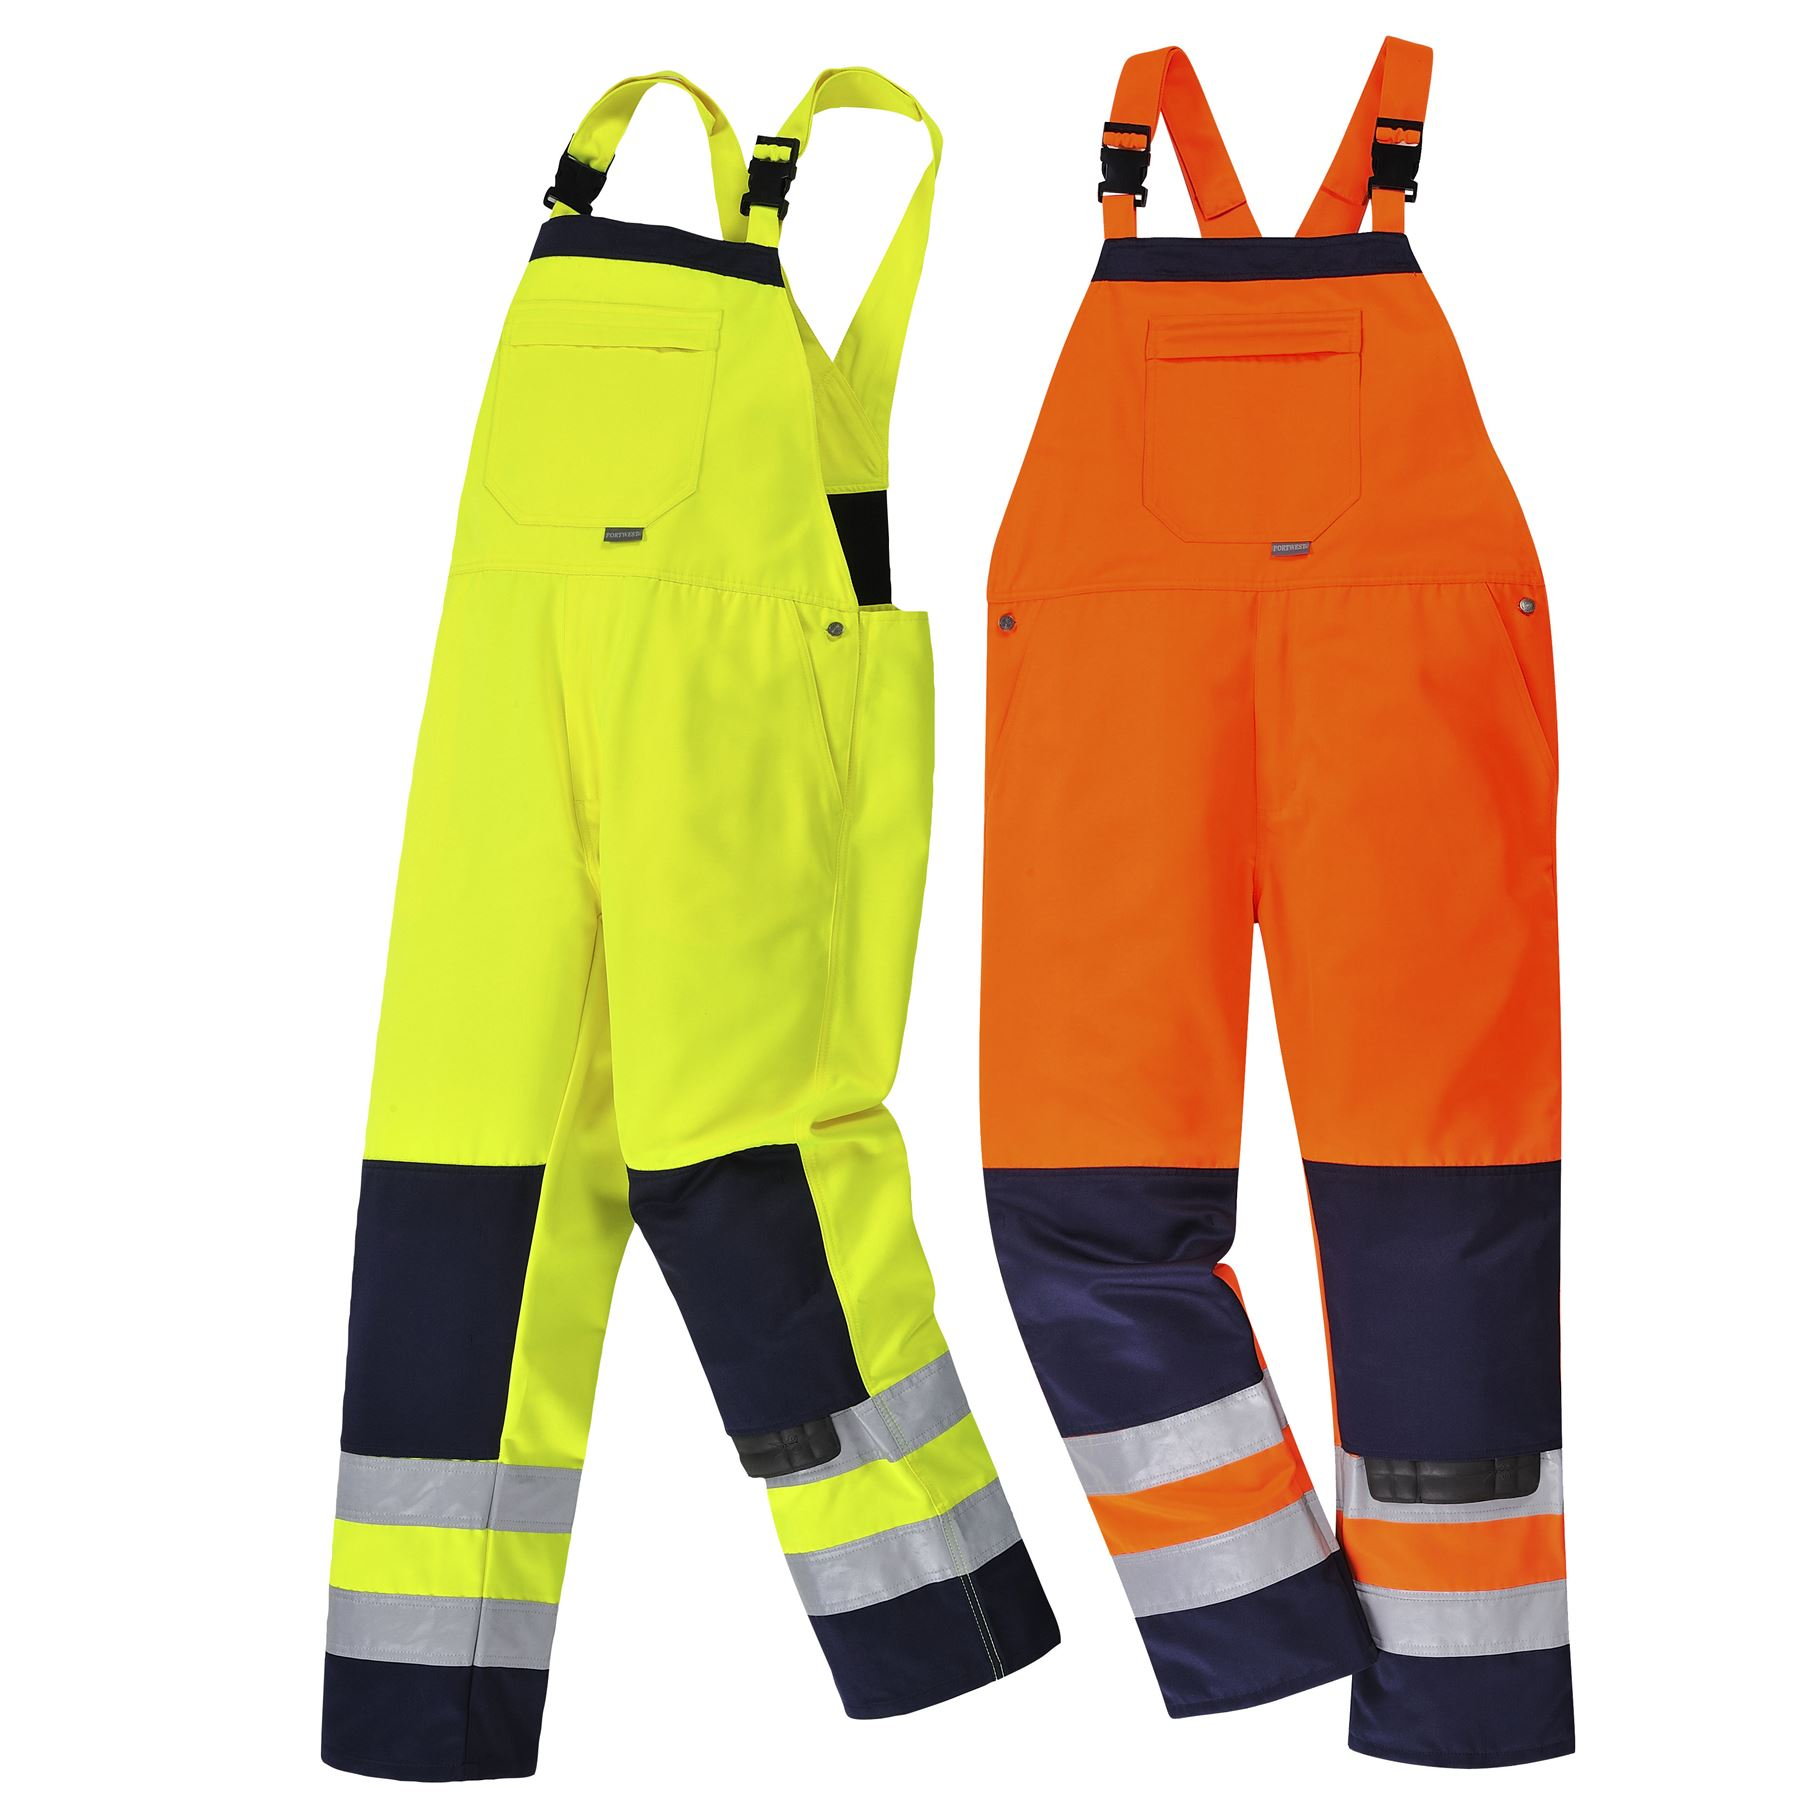 Portwest-Girona-Hi-Vis-Bib-amp-Brace-Workwear-Trouser-Pants-Coverall-Overalls-TX72